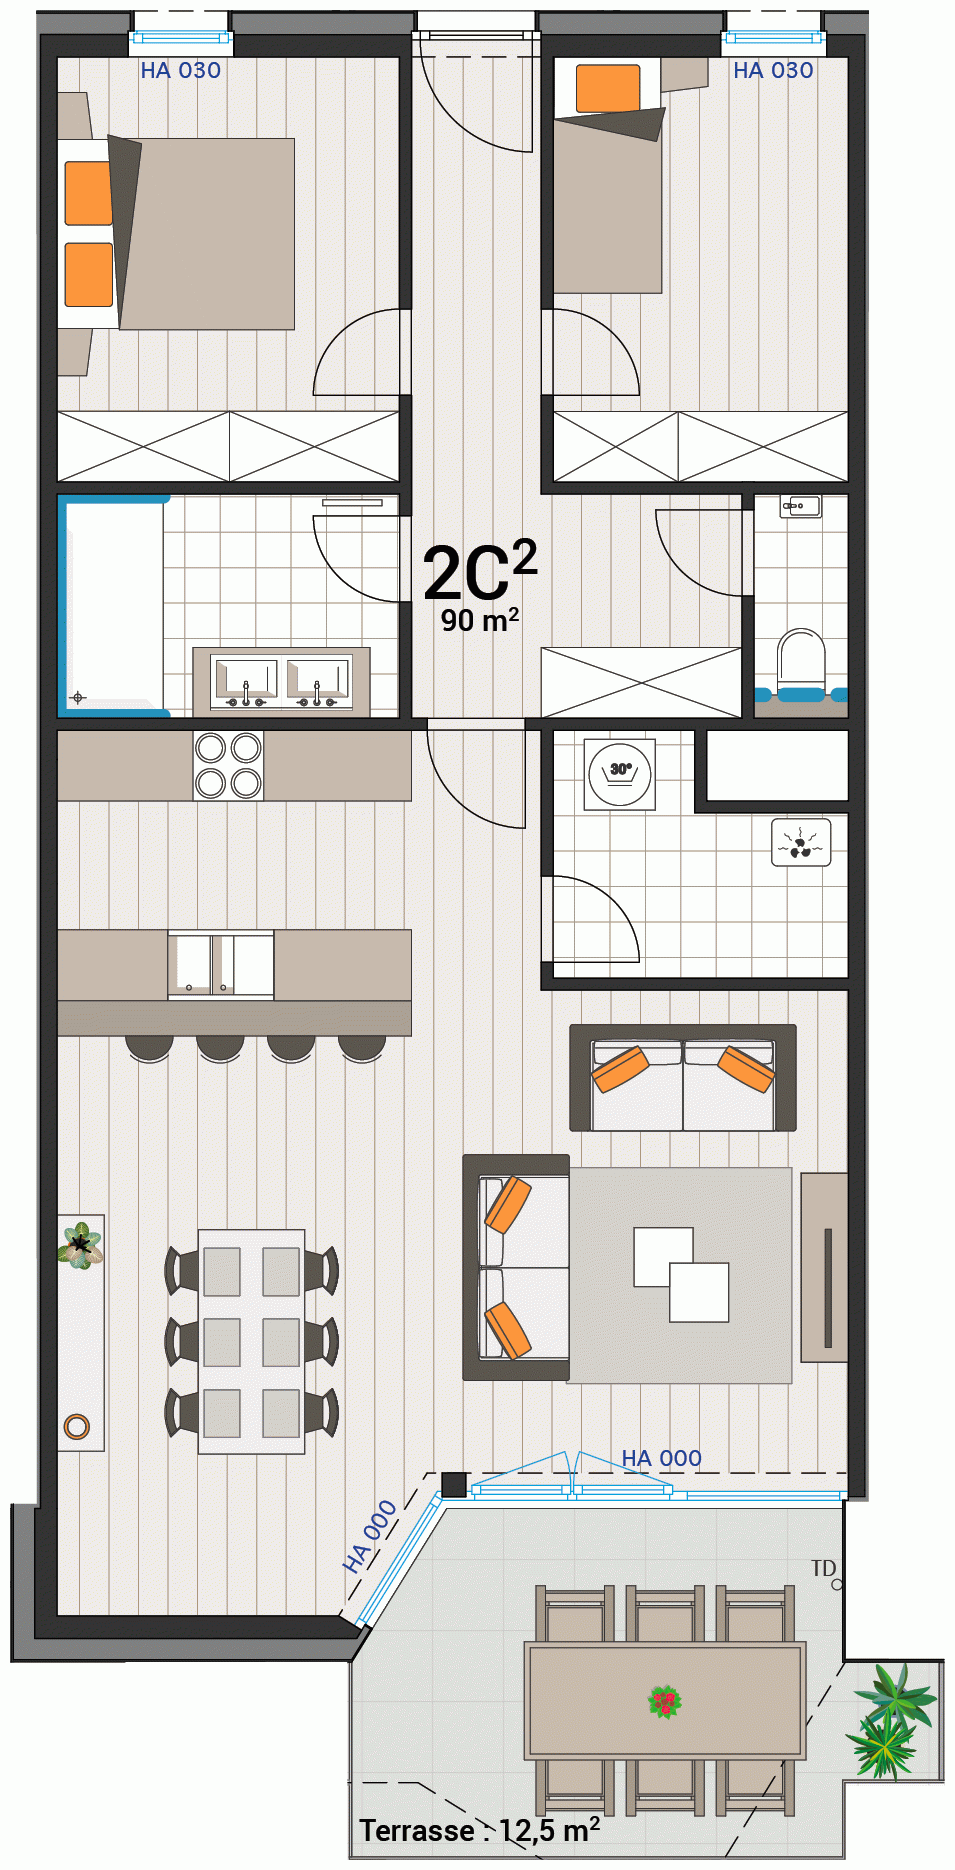 Appartement 2C